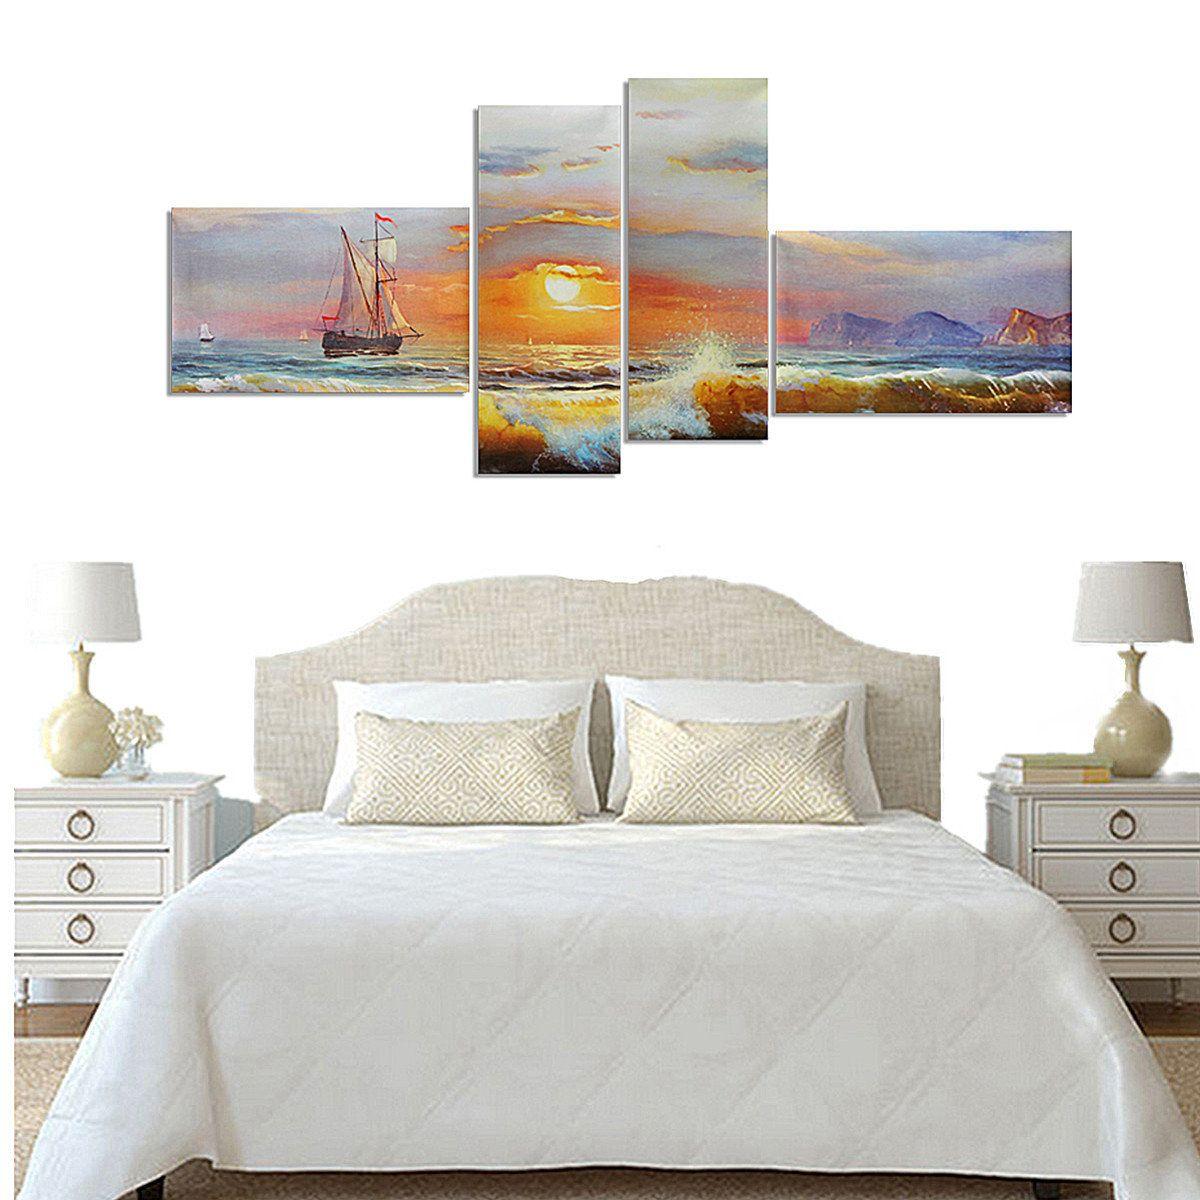 Wall Decor In Bedroom Impressive Sea Landscape Canvas Painting Modern Frameless Wall Art Bedroom Design Inspiration